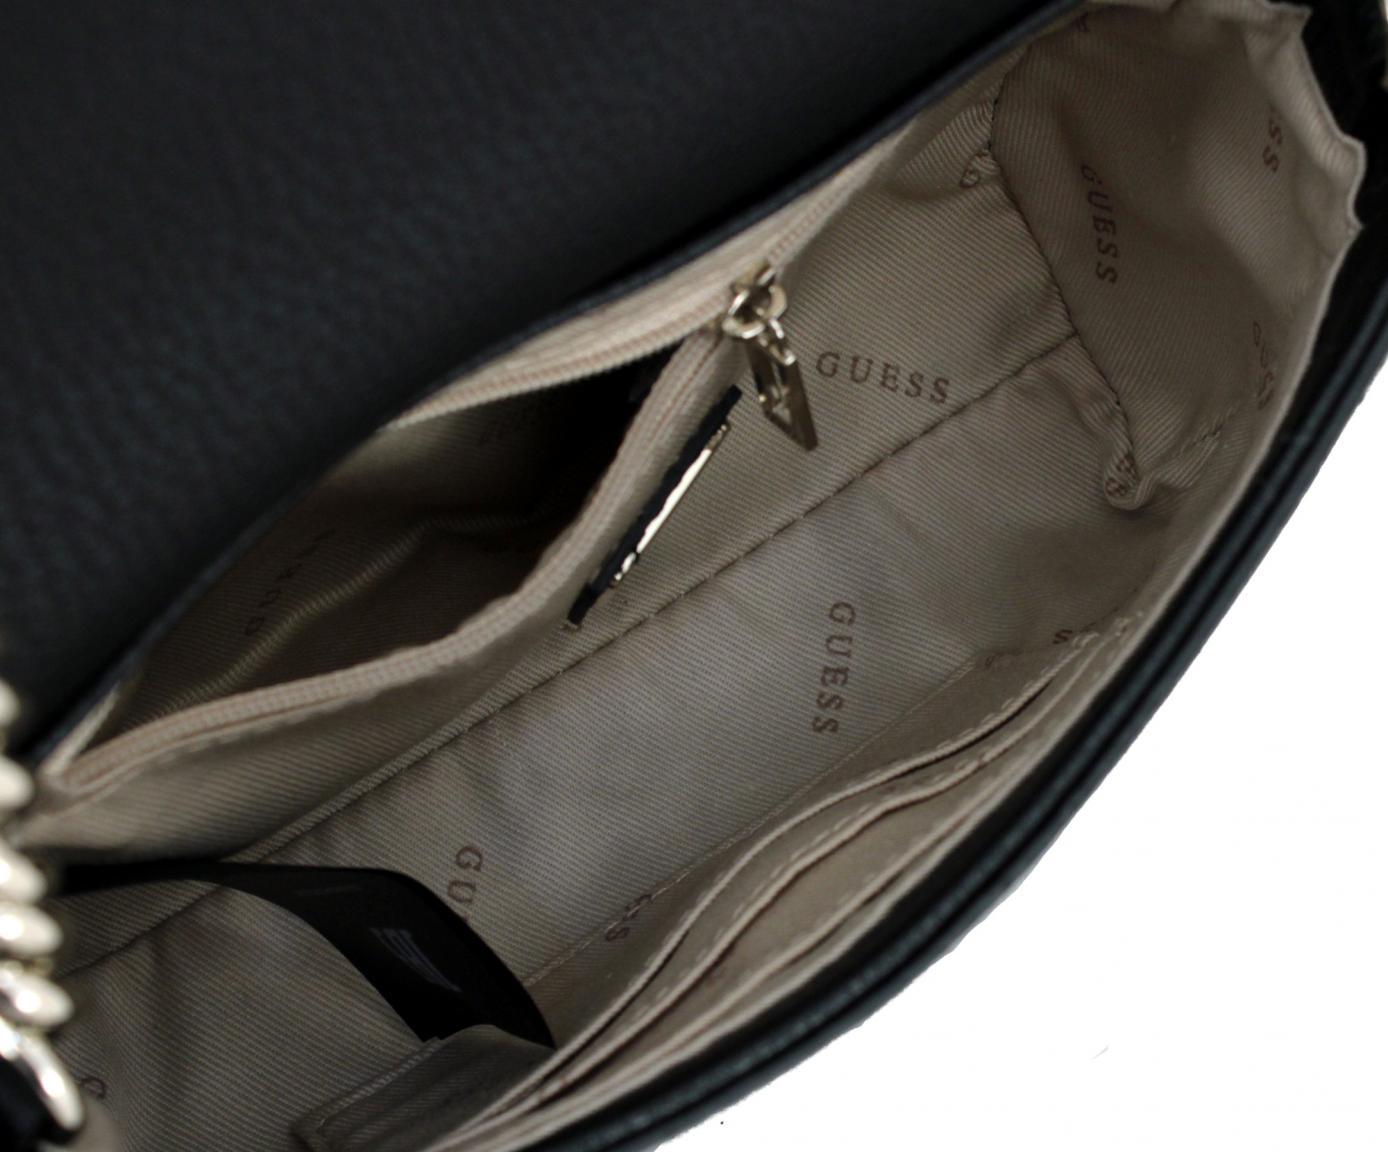 b6e1811158de1 Alma Mini Umhängetasche Crossbody Flap schwarz Kette Guess - Bags   more